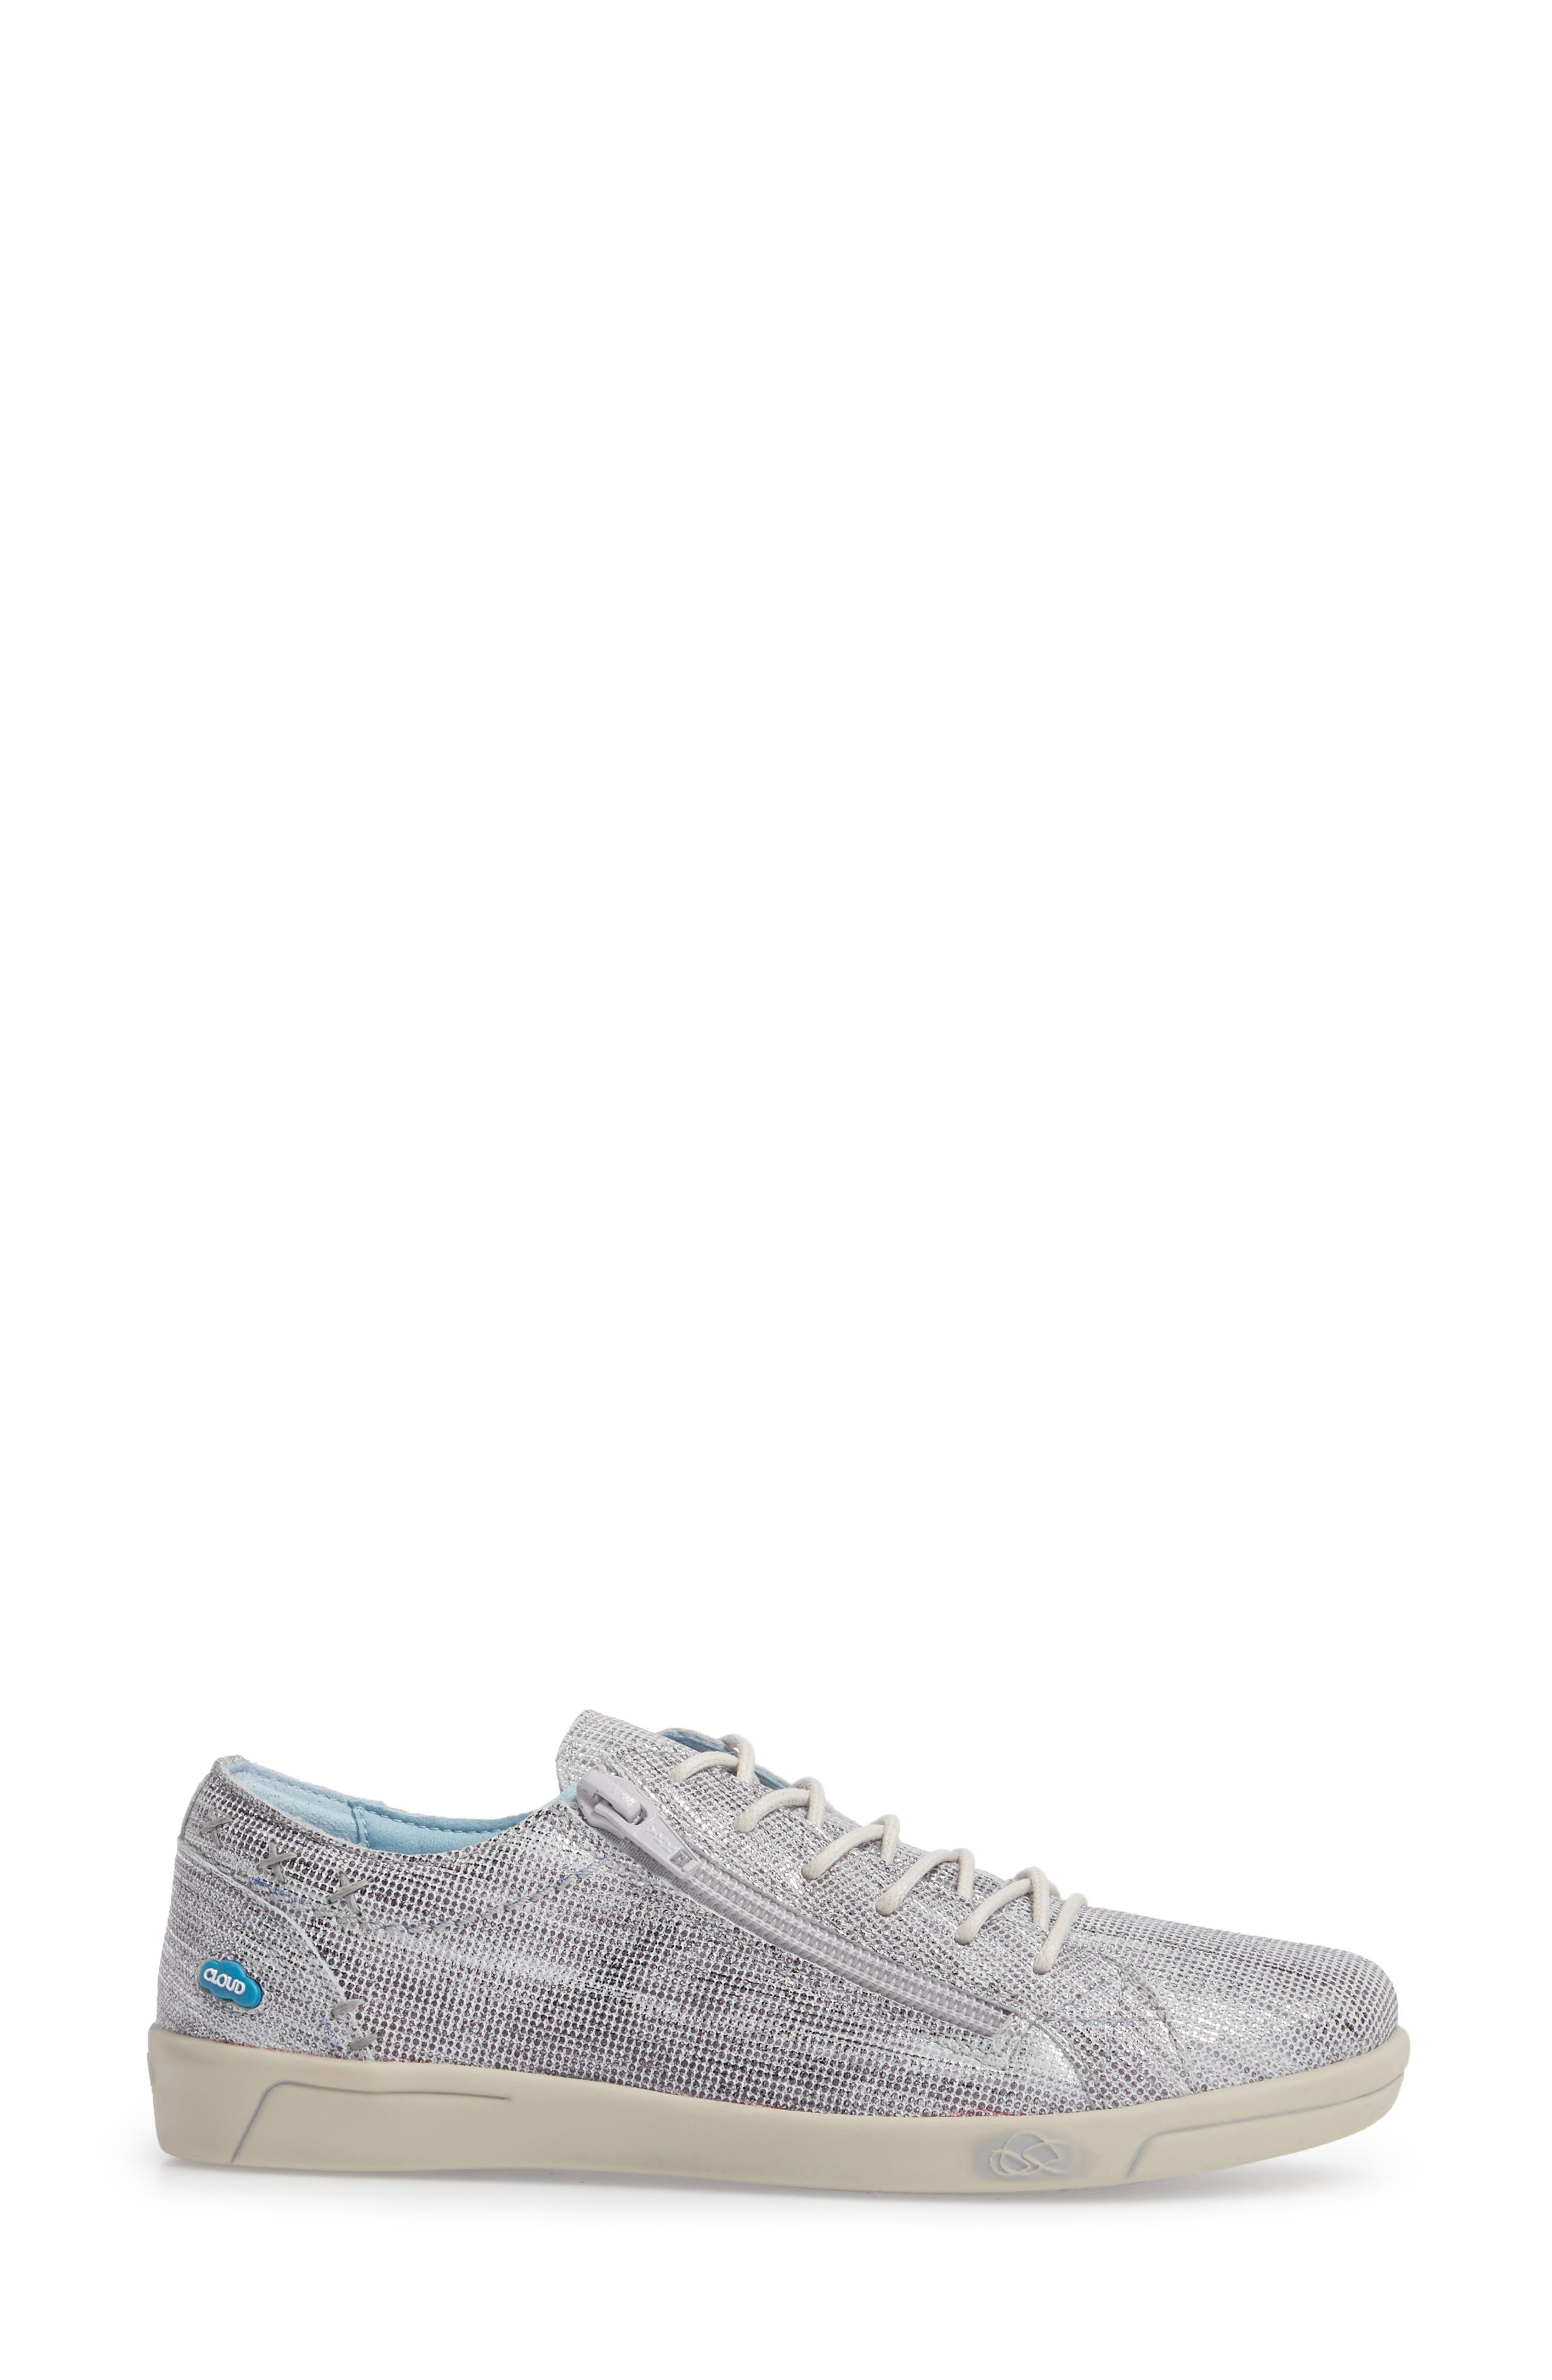 Aika Dunkan Sneaker,                             Alternate thumbnail 3, color,                             GREY LEATHER